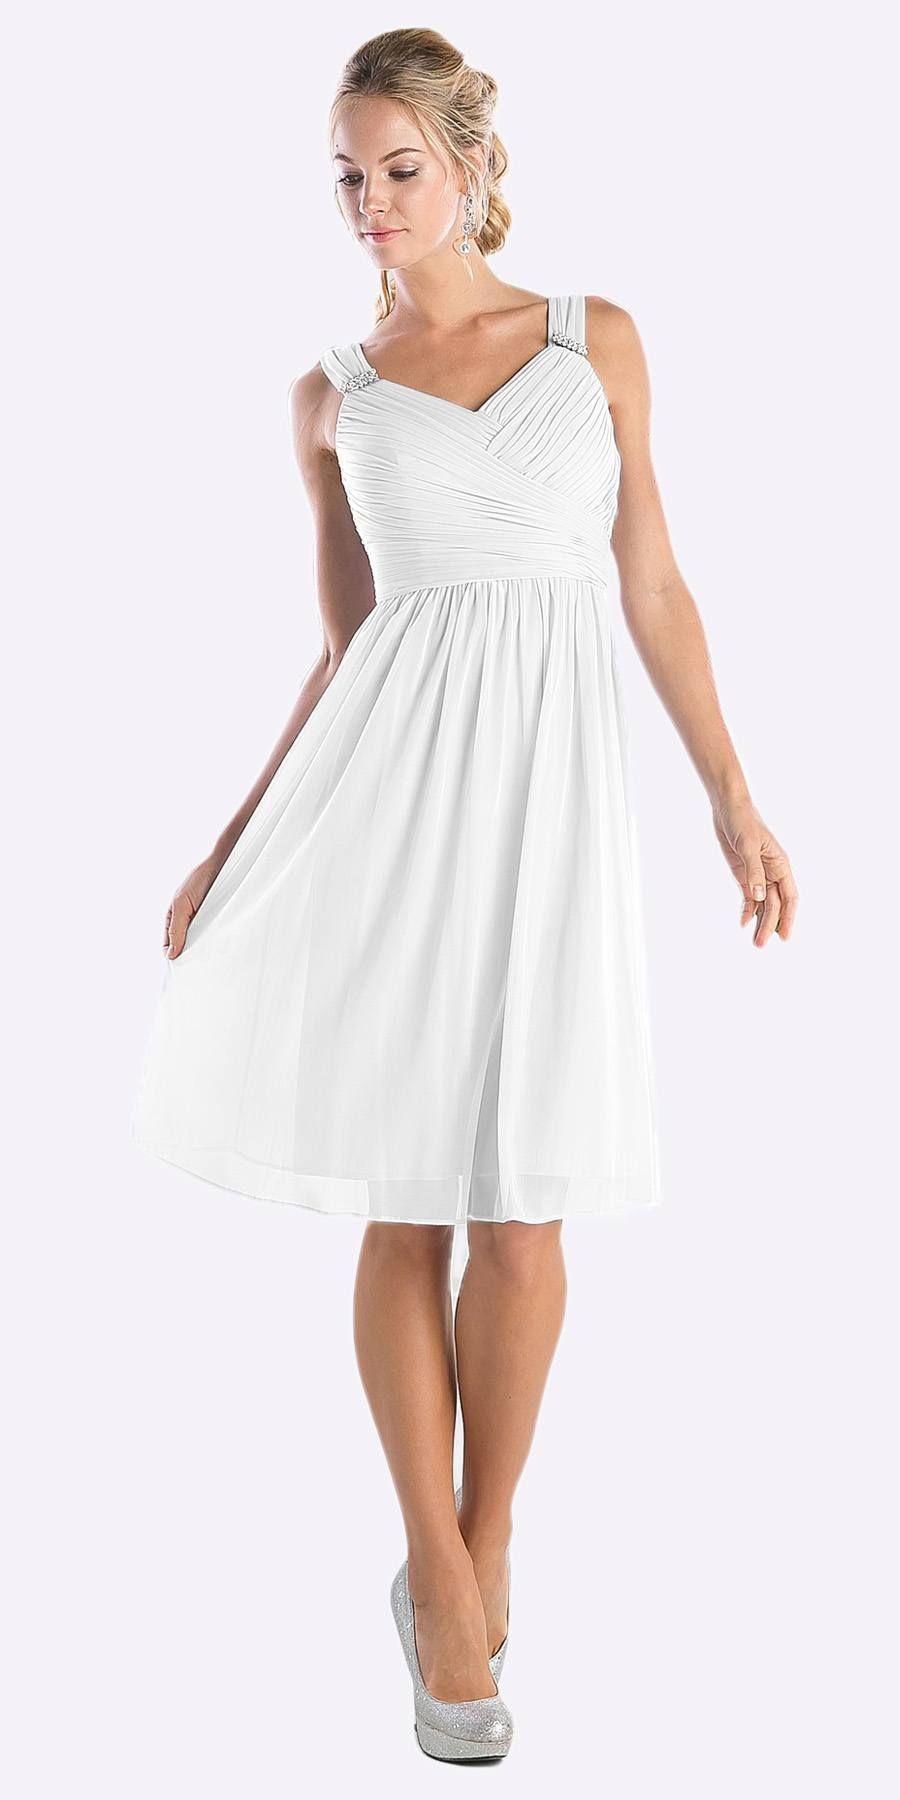 Wedding beach dress  Knee Length White Beach Wedding Bridesmaid Dress Flowy Chiffon